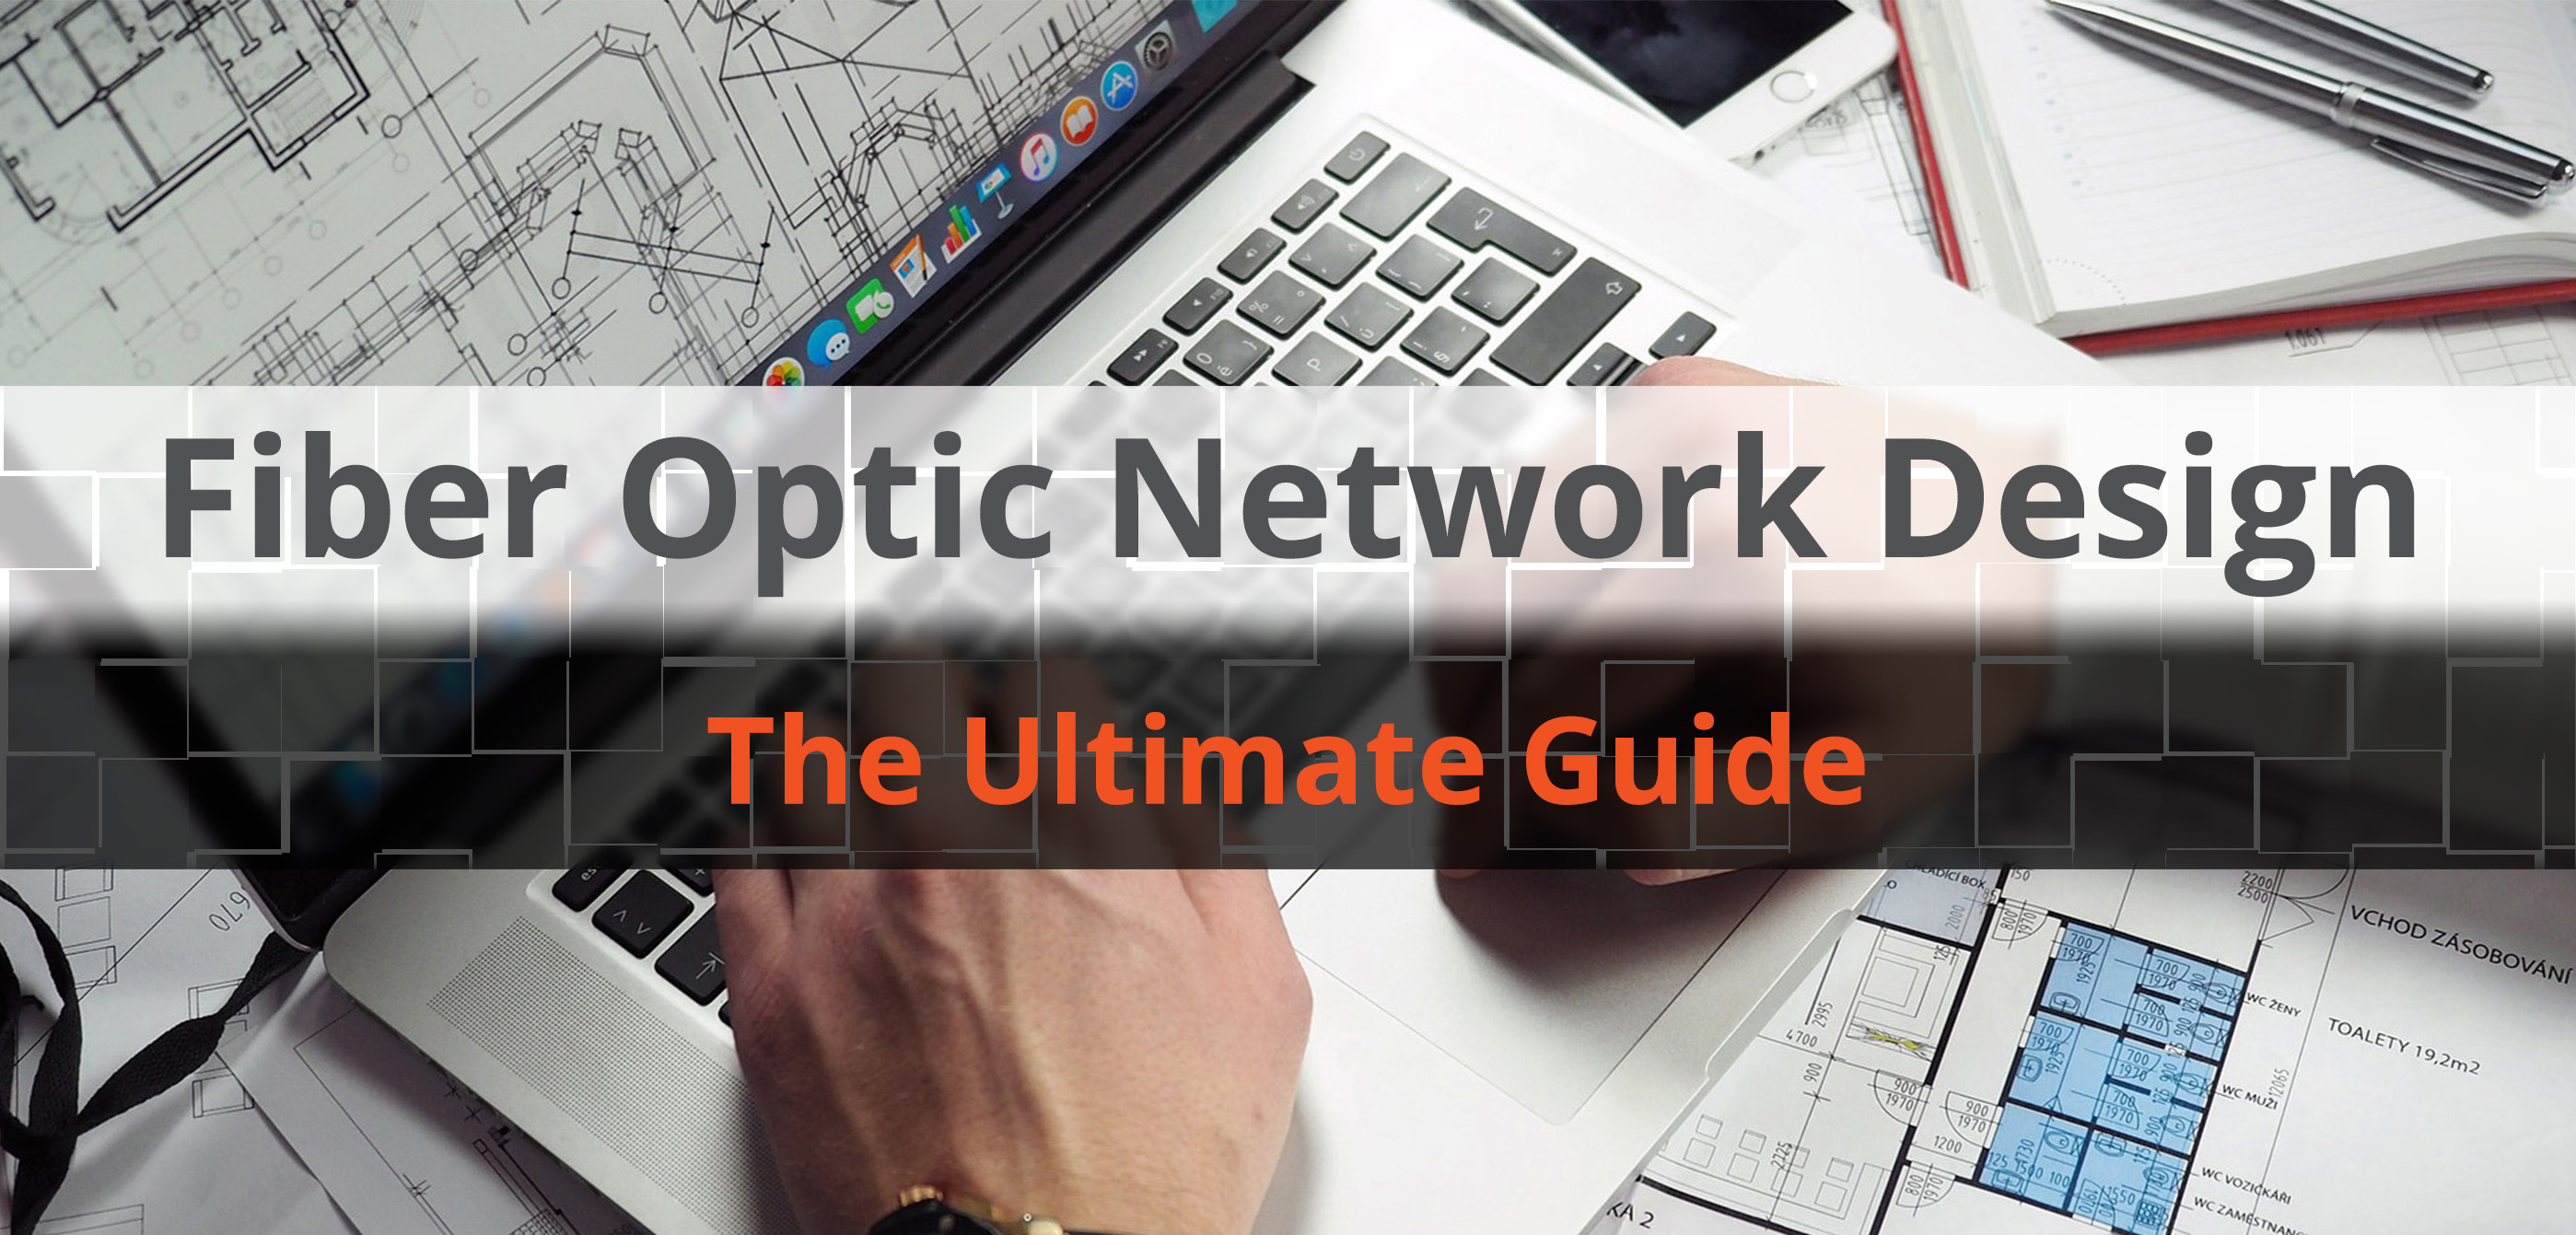 Resource Center - Fiber Optic Network Design - Landing Page (featured image)